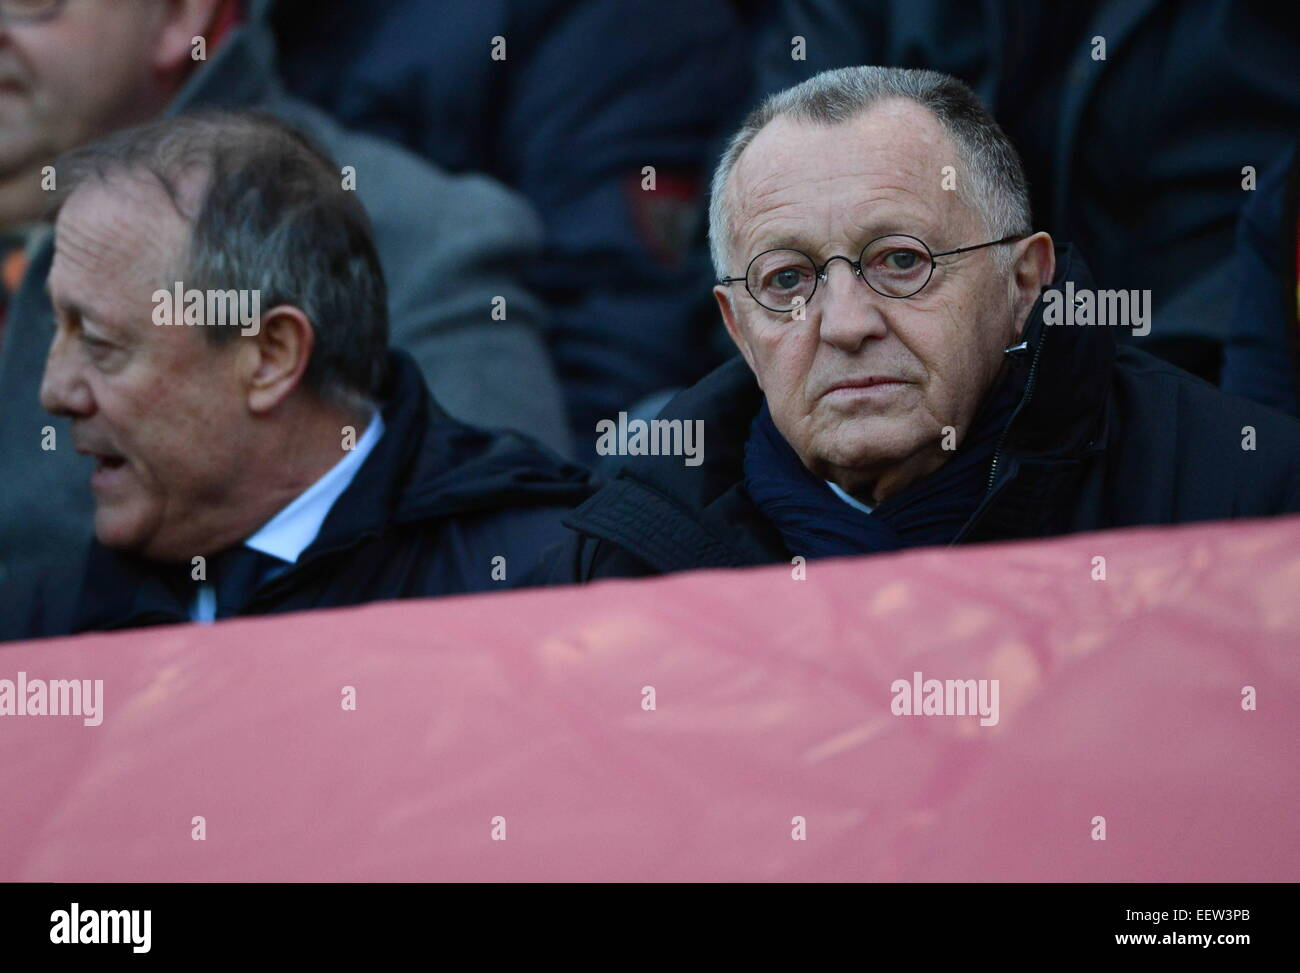 Jean Michel aulas - 17.01.2015 - Lente/Lyon - 21eme journee Ligue 1.Foto: Dave Winter/Icon Sport Foto de stock